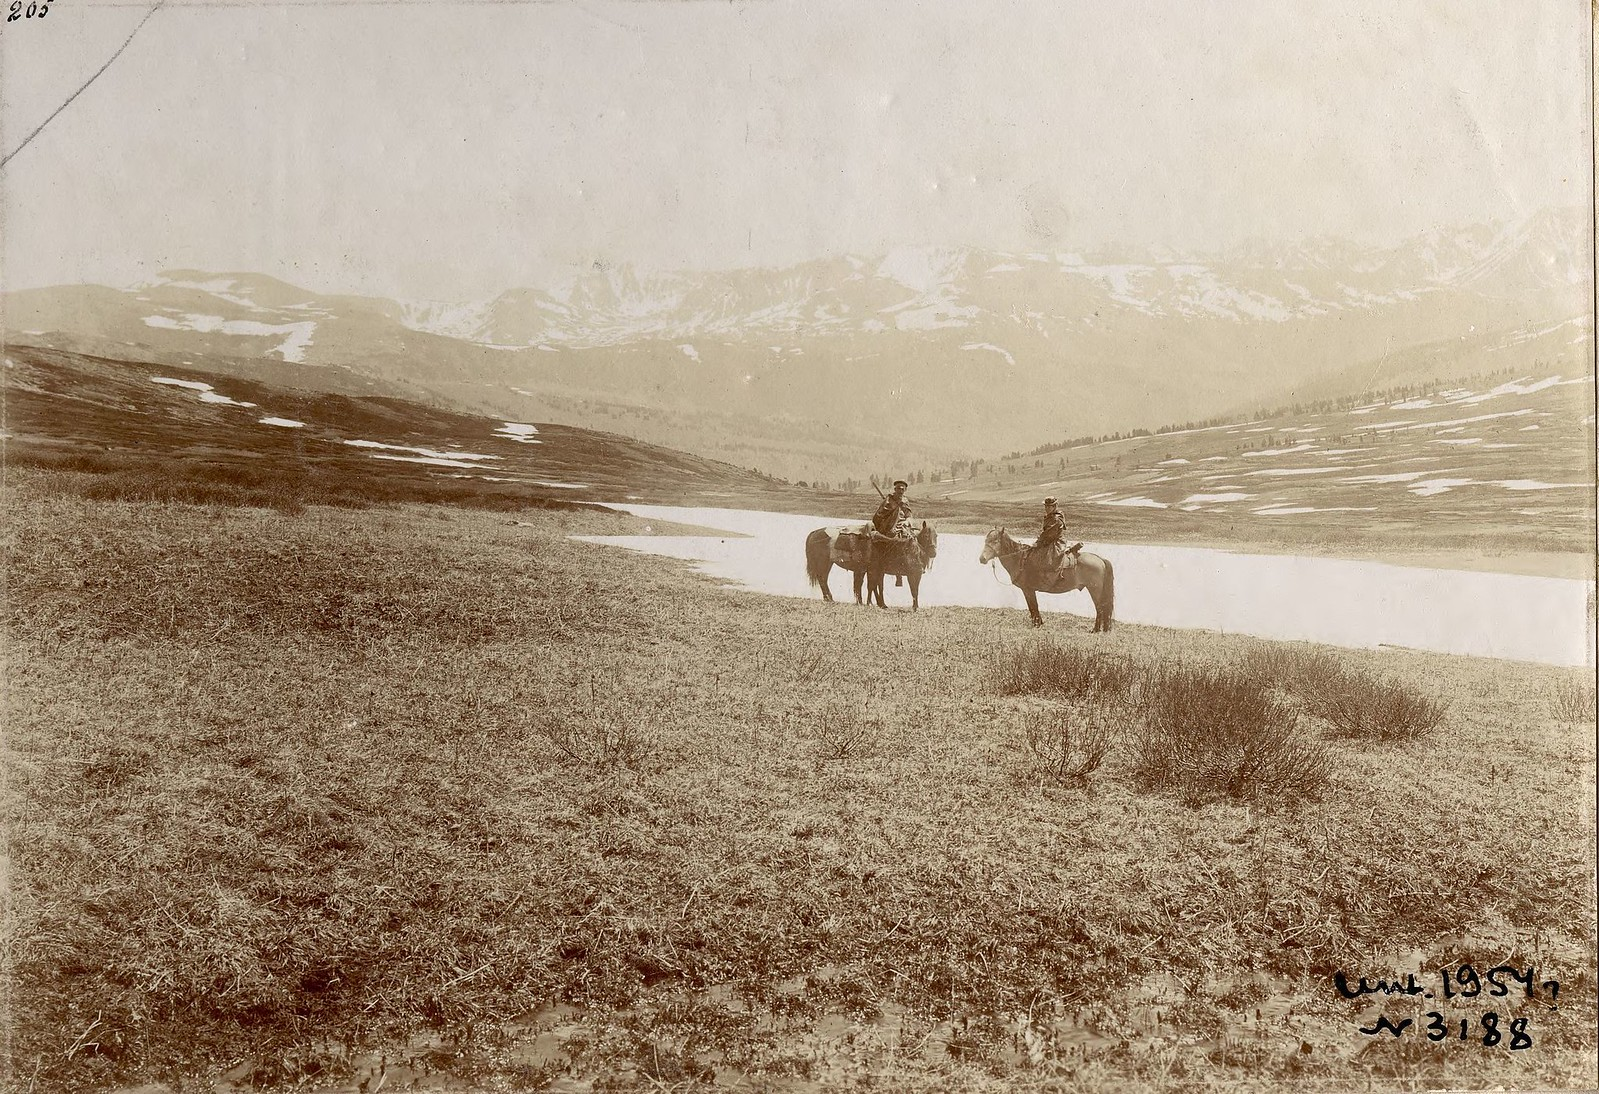 07. Участники экспедиции на фоне ледников Теректинского хребта